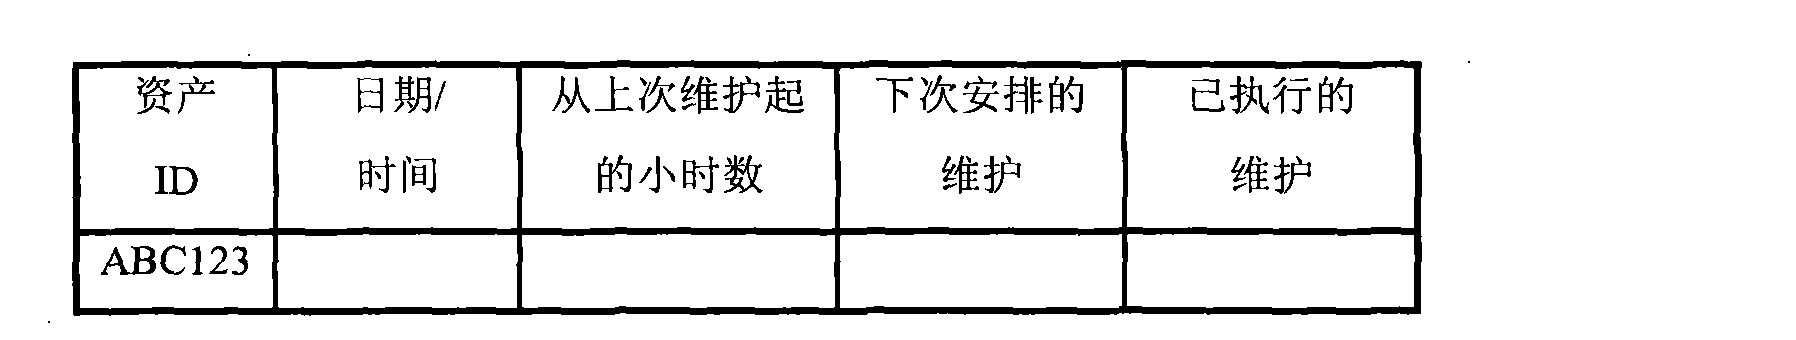 Figure CN203311224UD00113